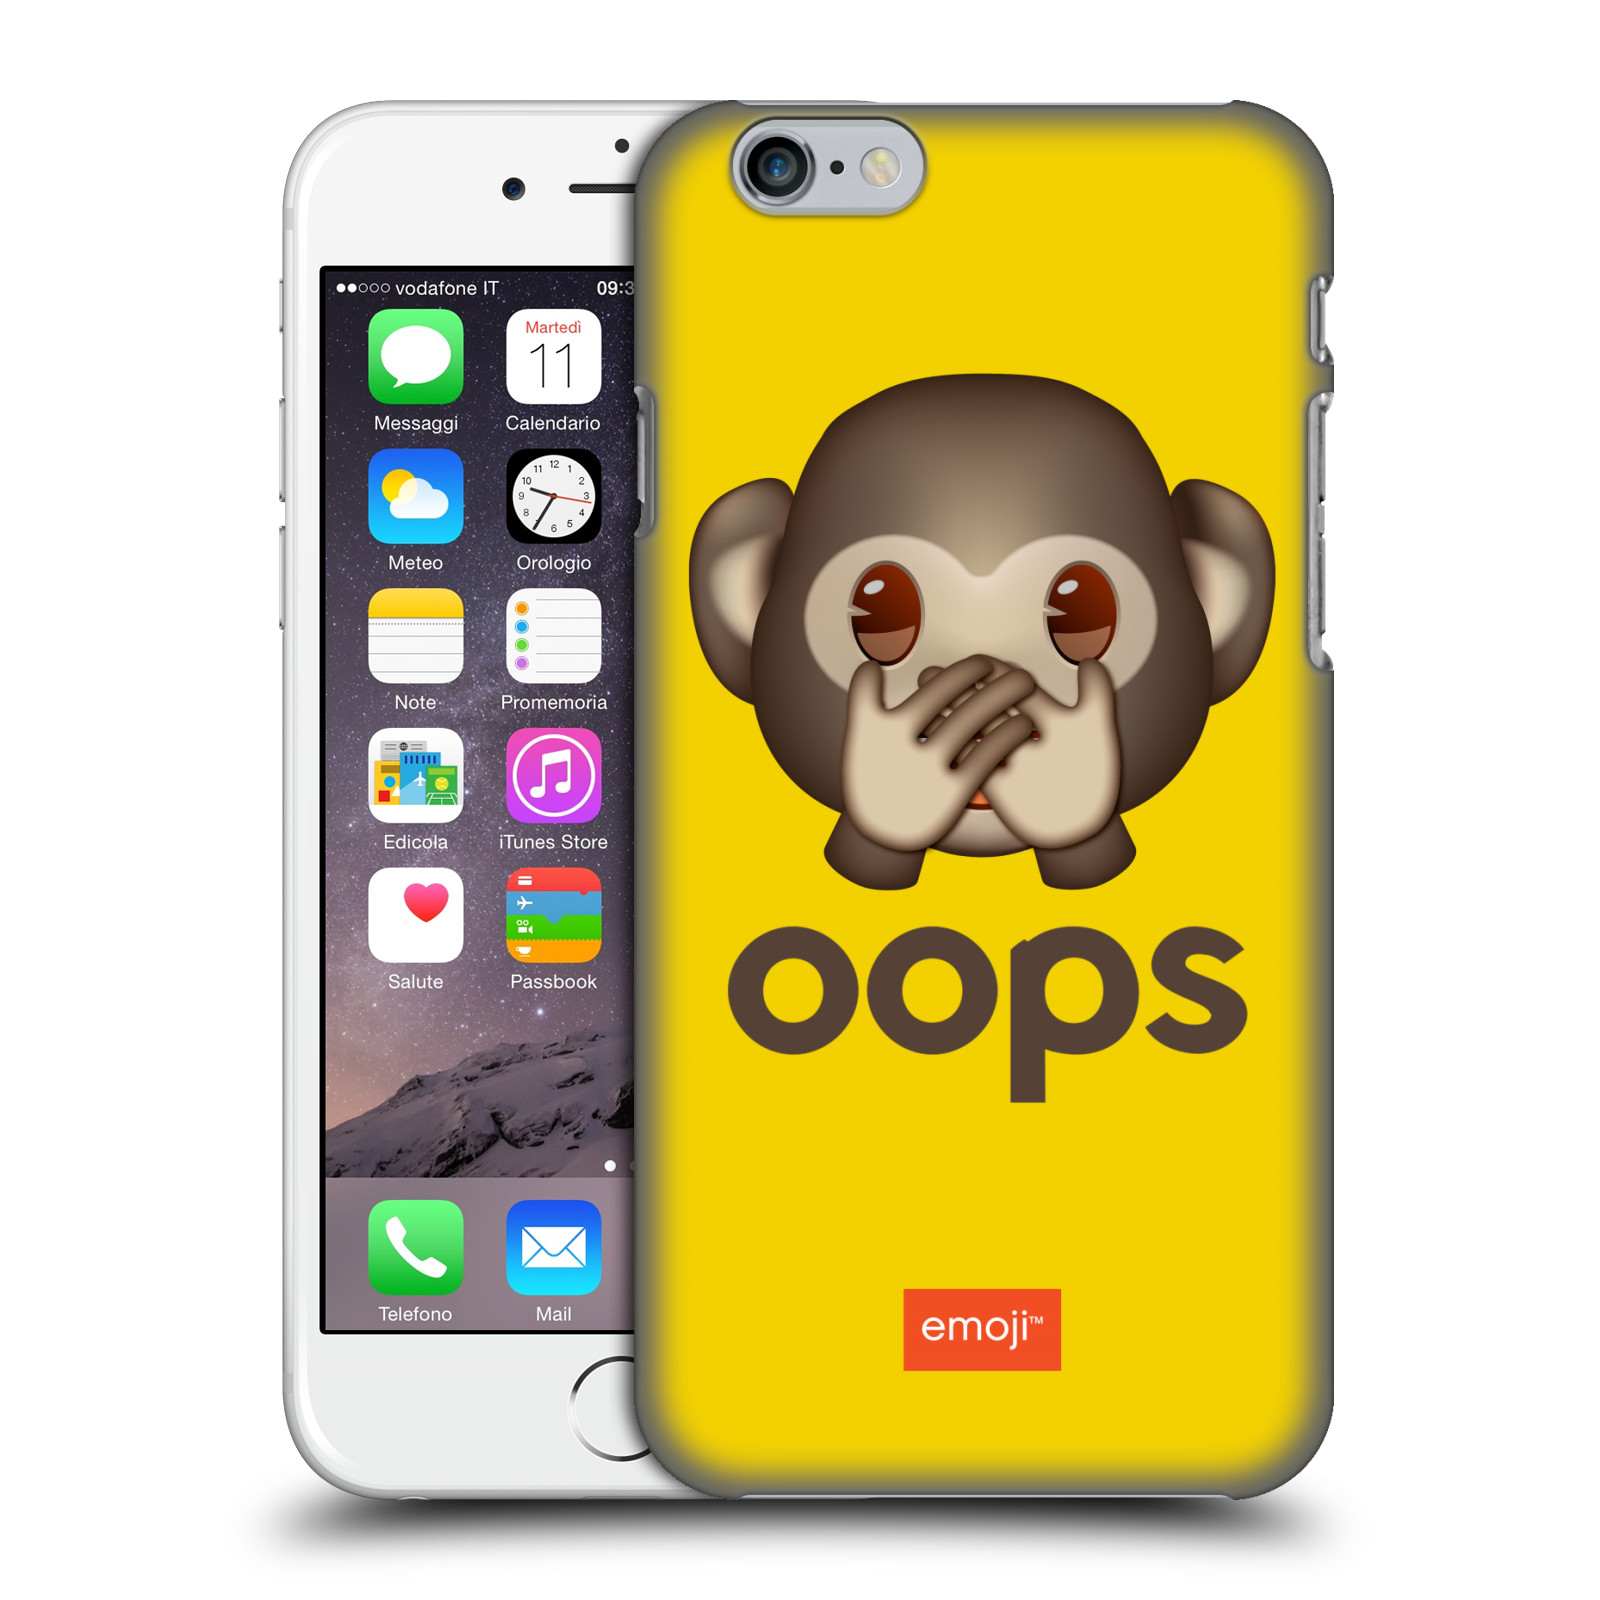 Plastové pouzdro na mobil Apple iPhone 6 HEAD CASE EMOJI - Opička OOPS